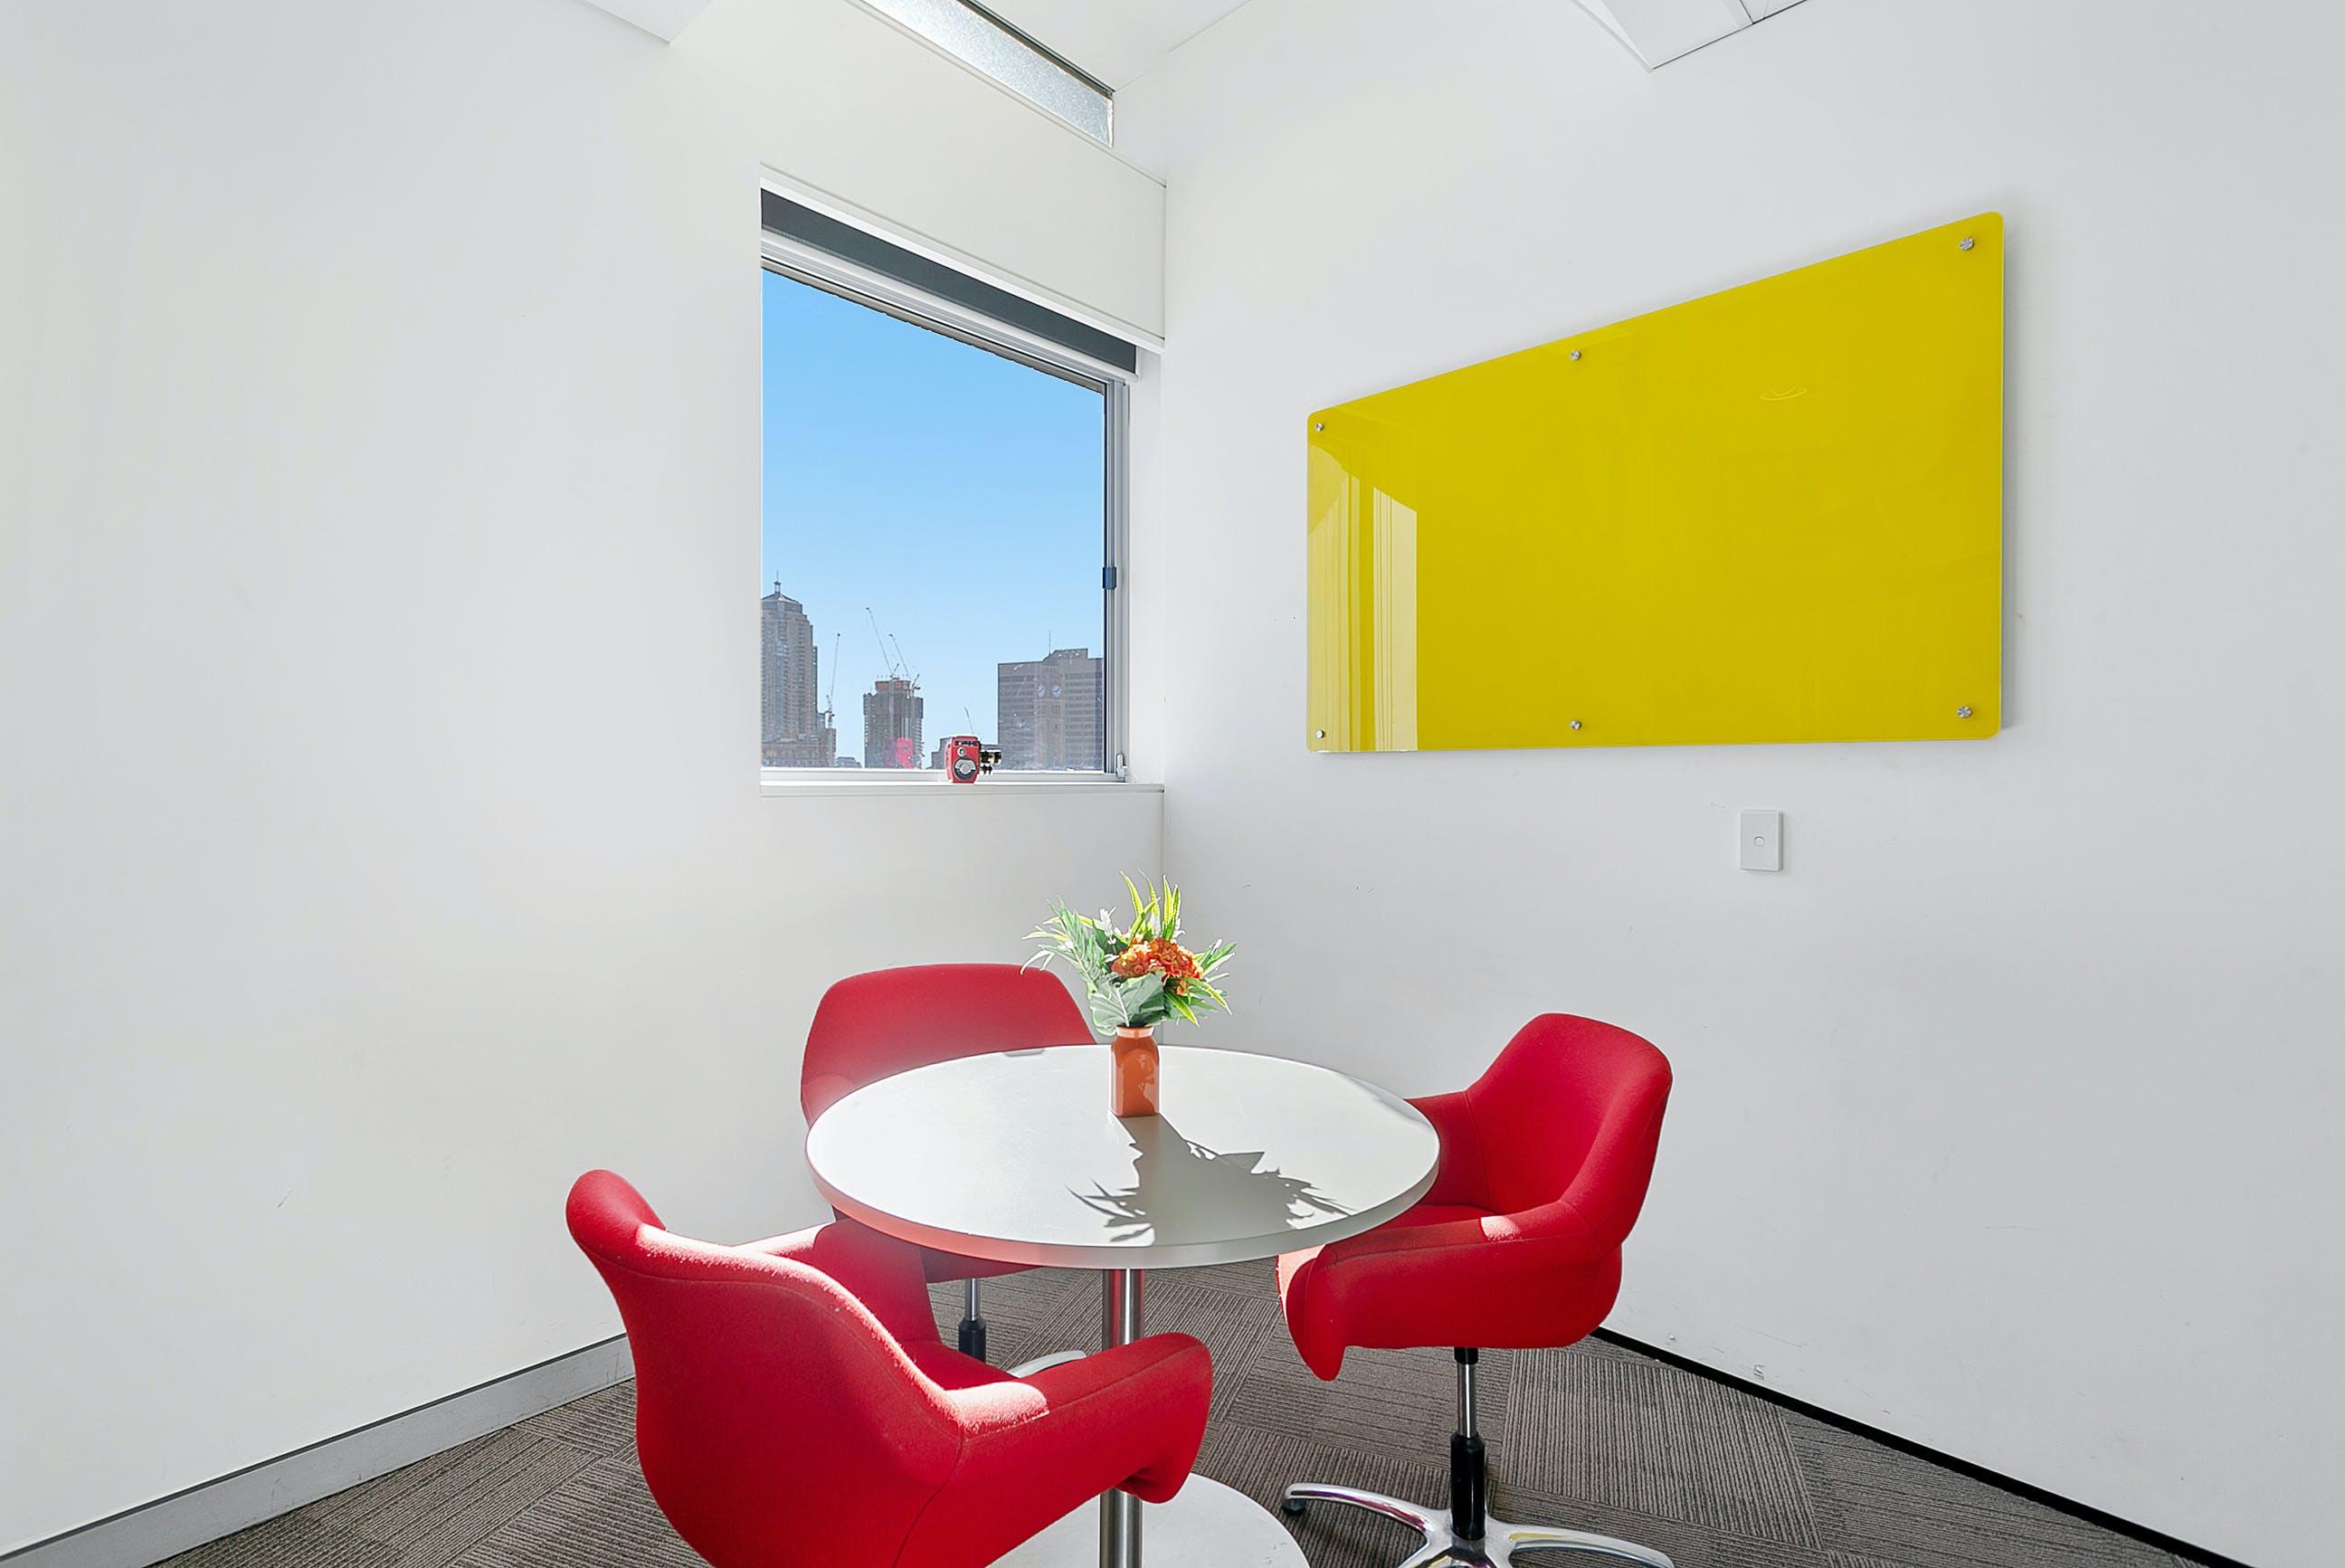 Meeting Room, meeting room at Aeona, image 1